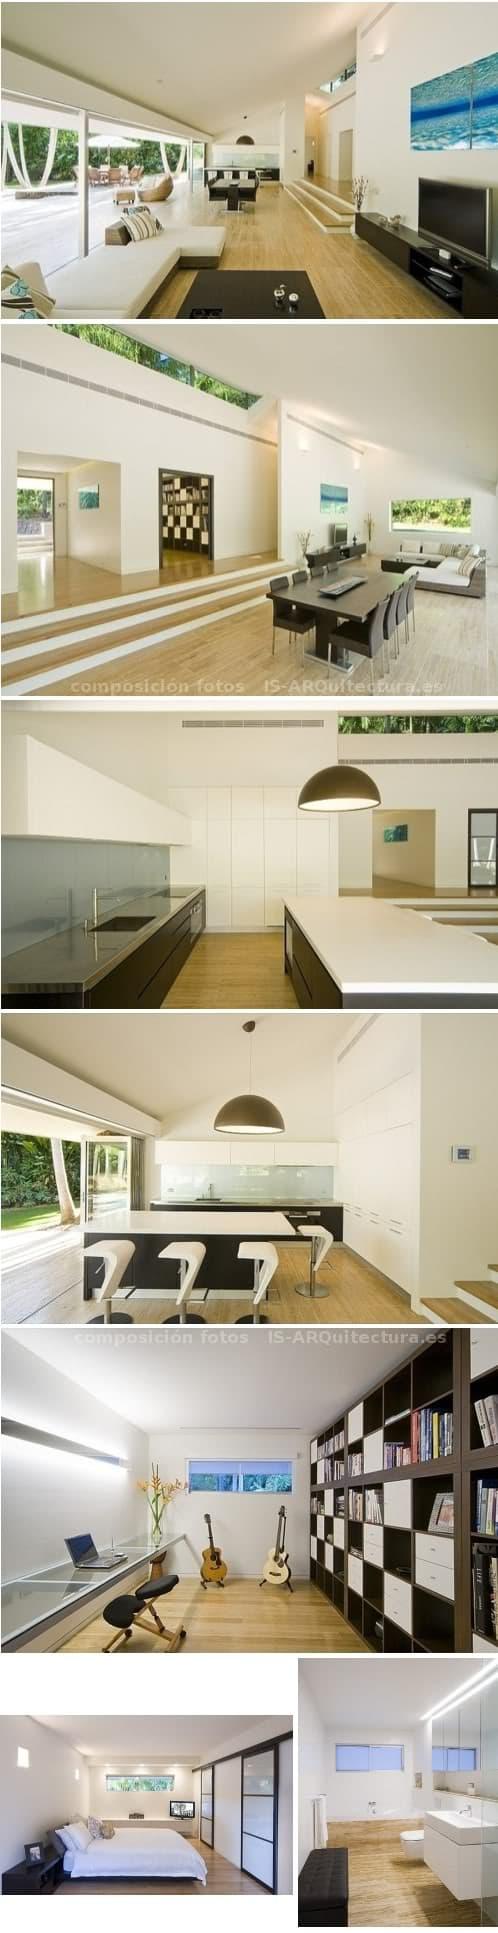 interior-casa-byron-bay